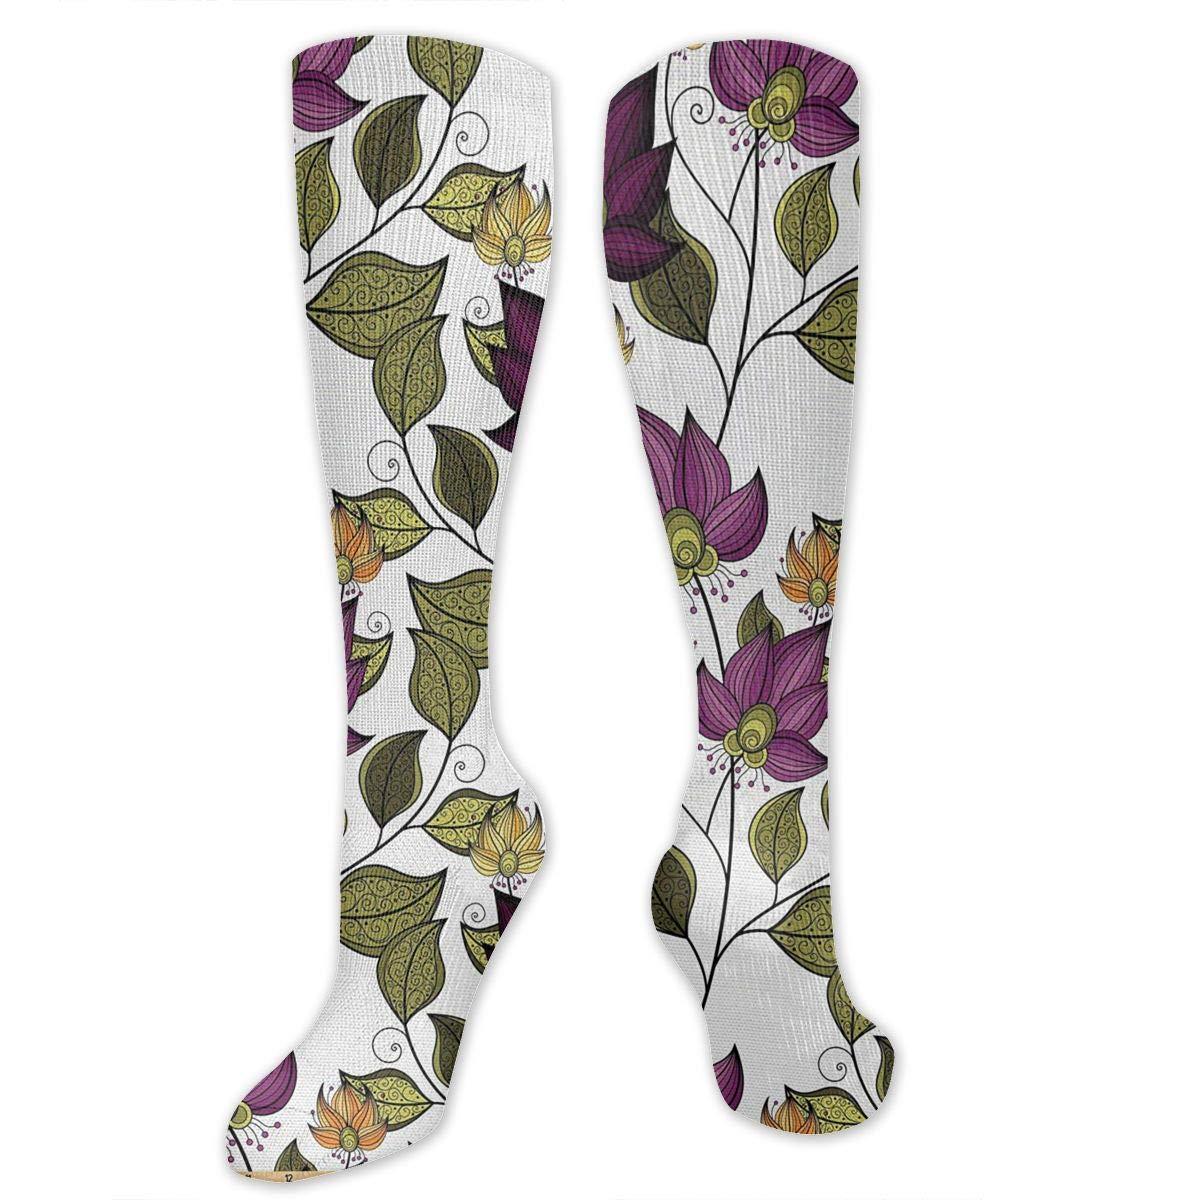 Chanwazibibiliu Vibrant Colored Floral Pattern Mens Colorful Dress Socks Funky Men Multicolored Pattern Fashionable Fun Crew Cotton Socks